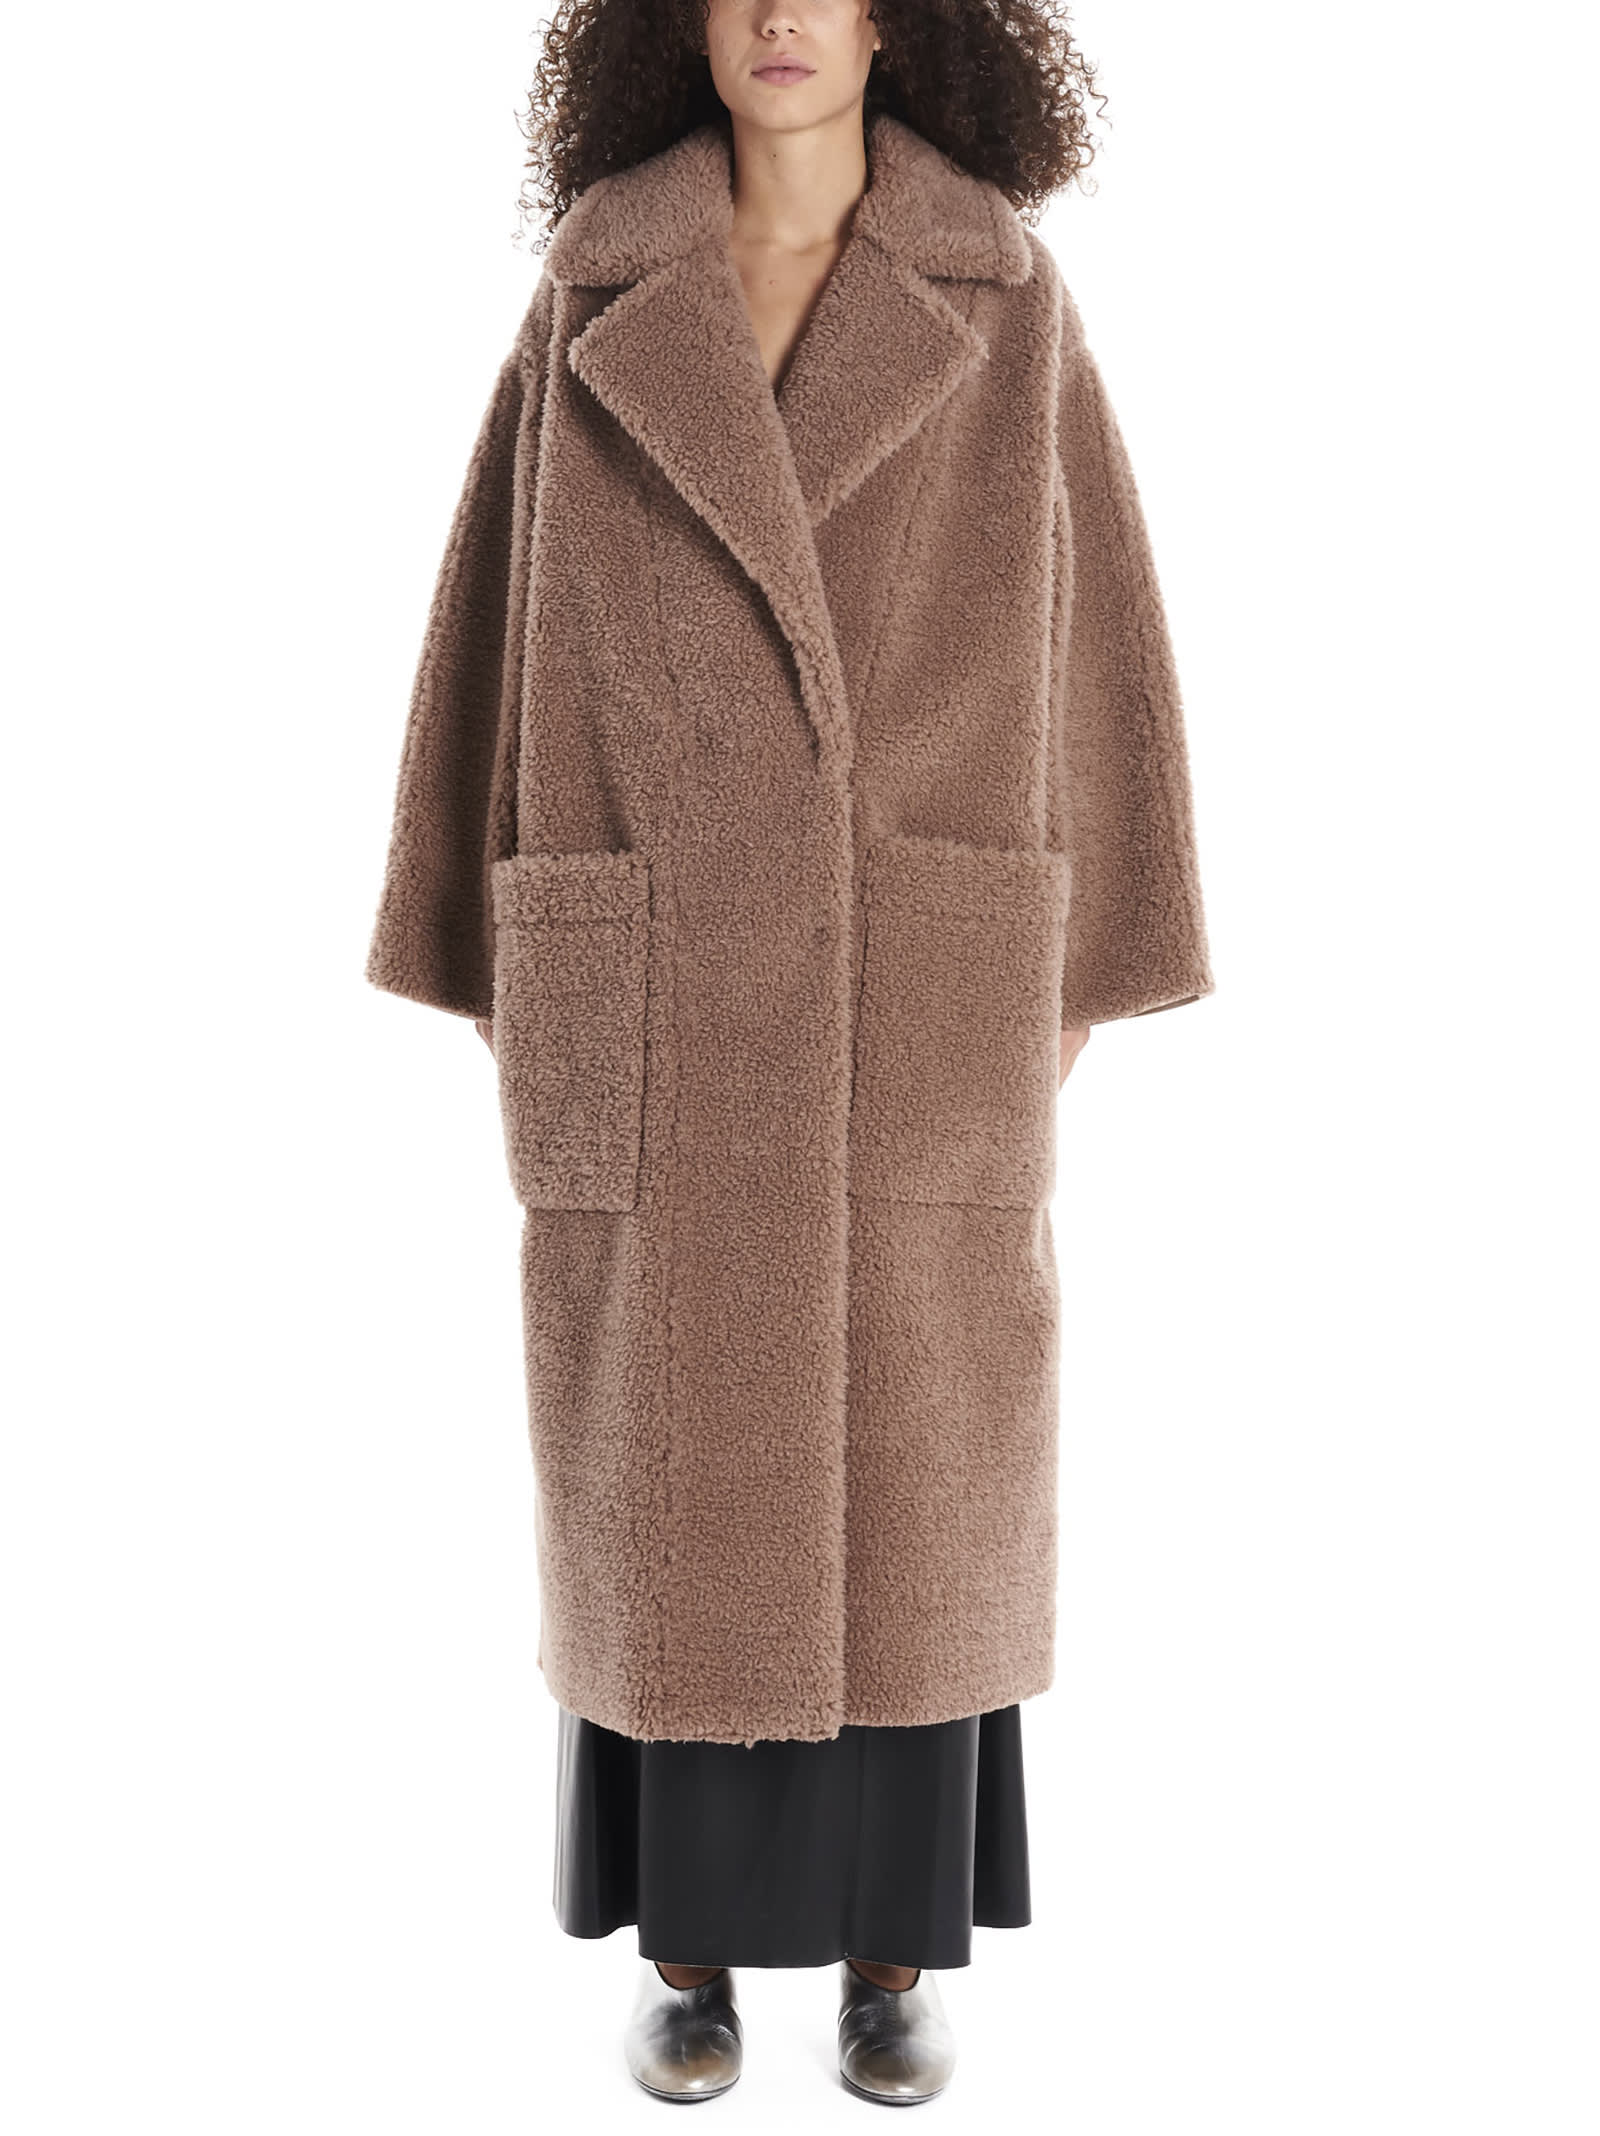 Nanushka Coats COAT